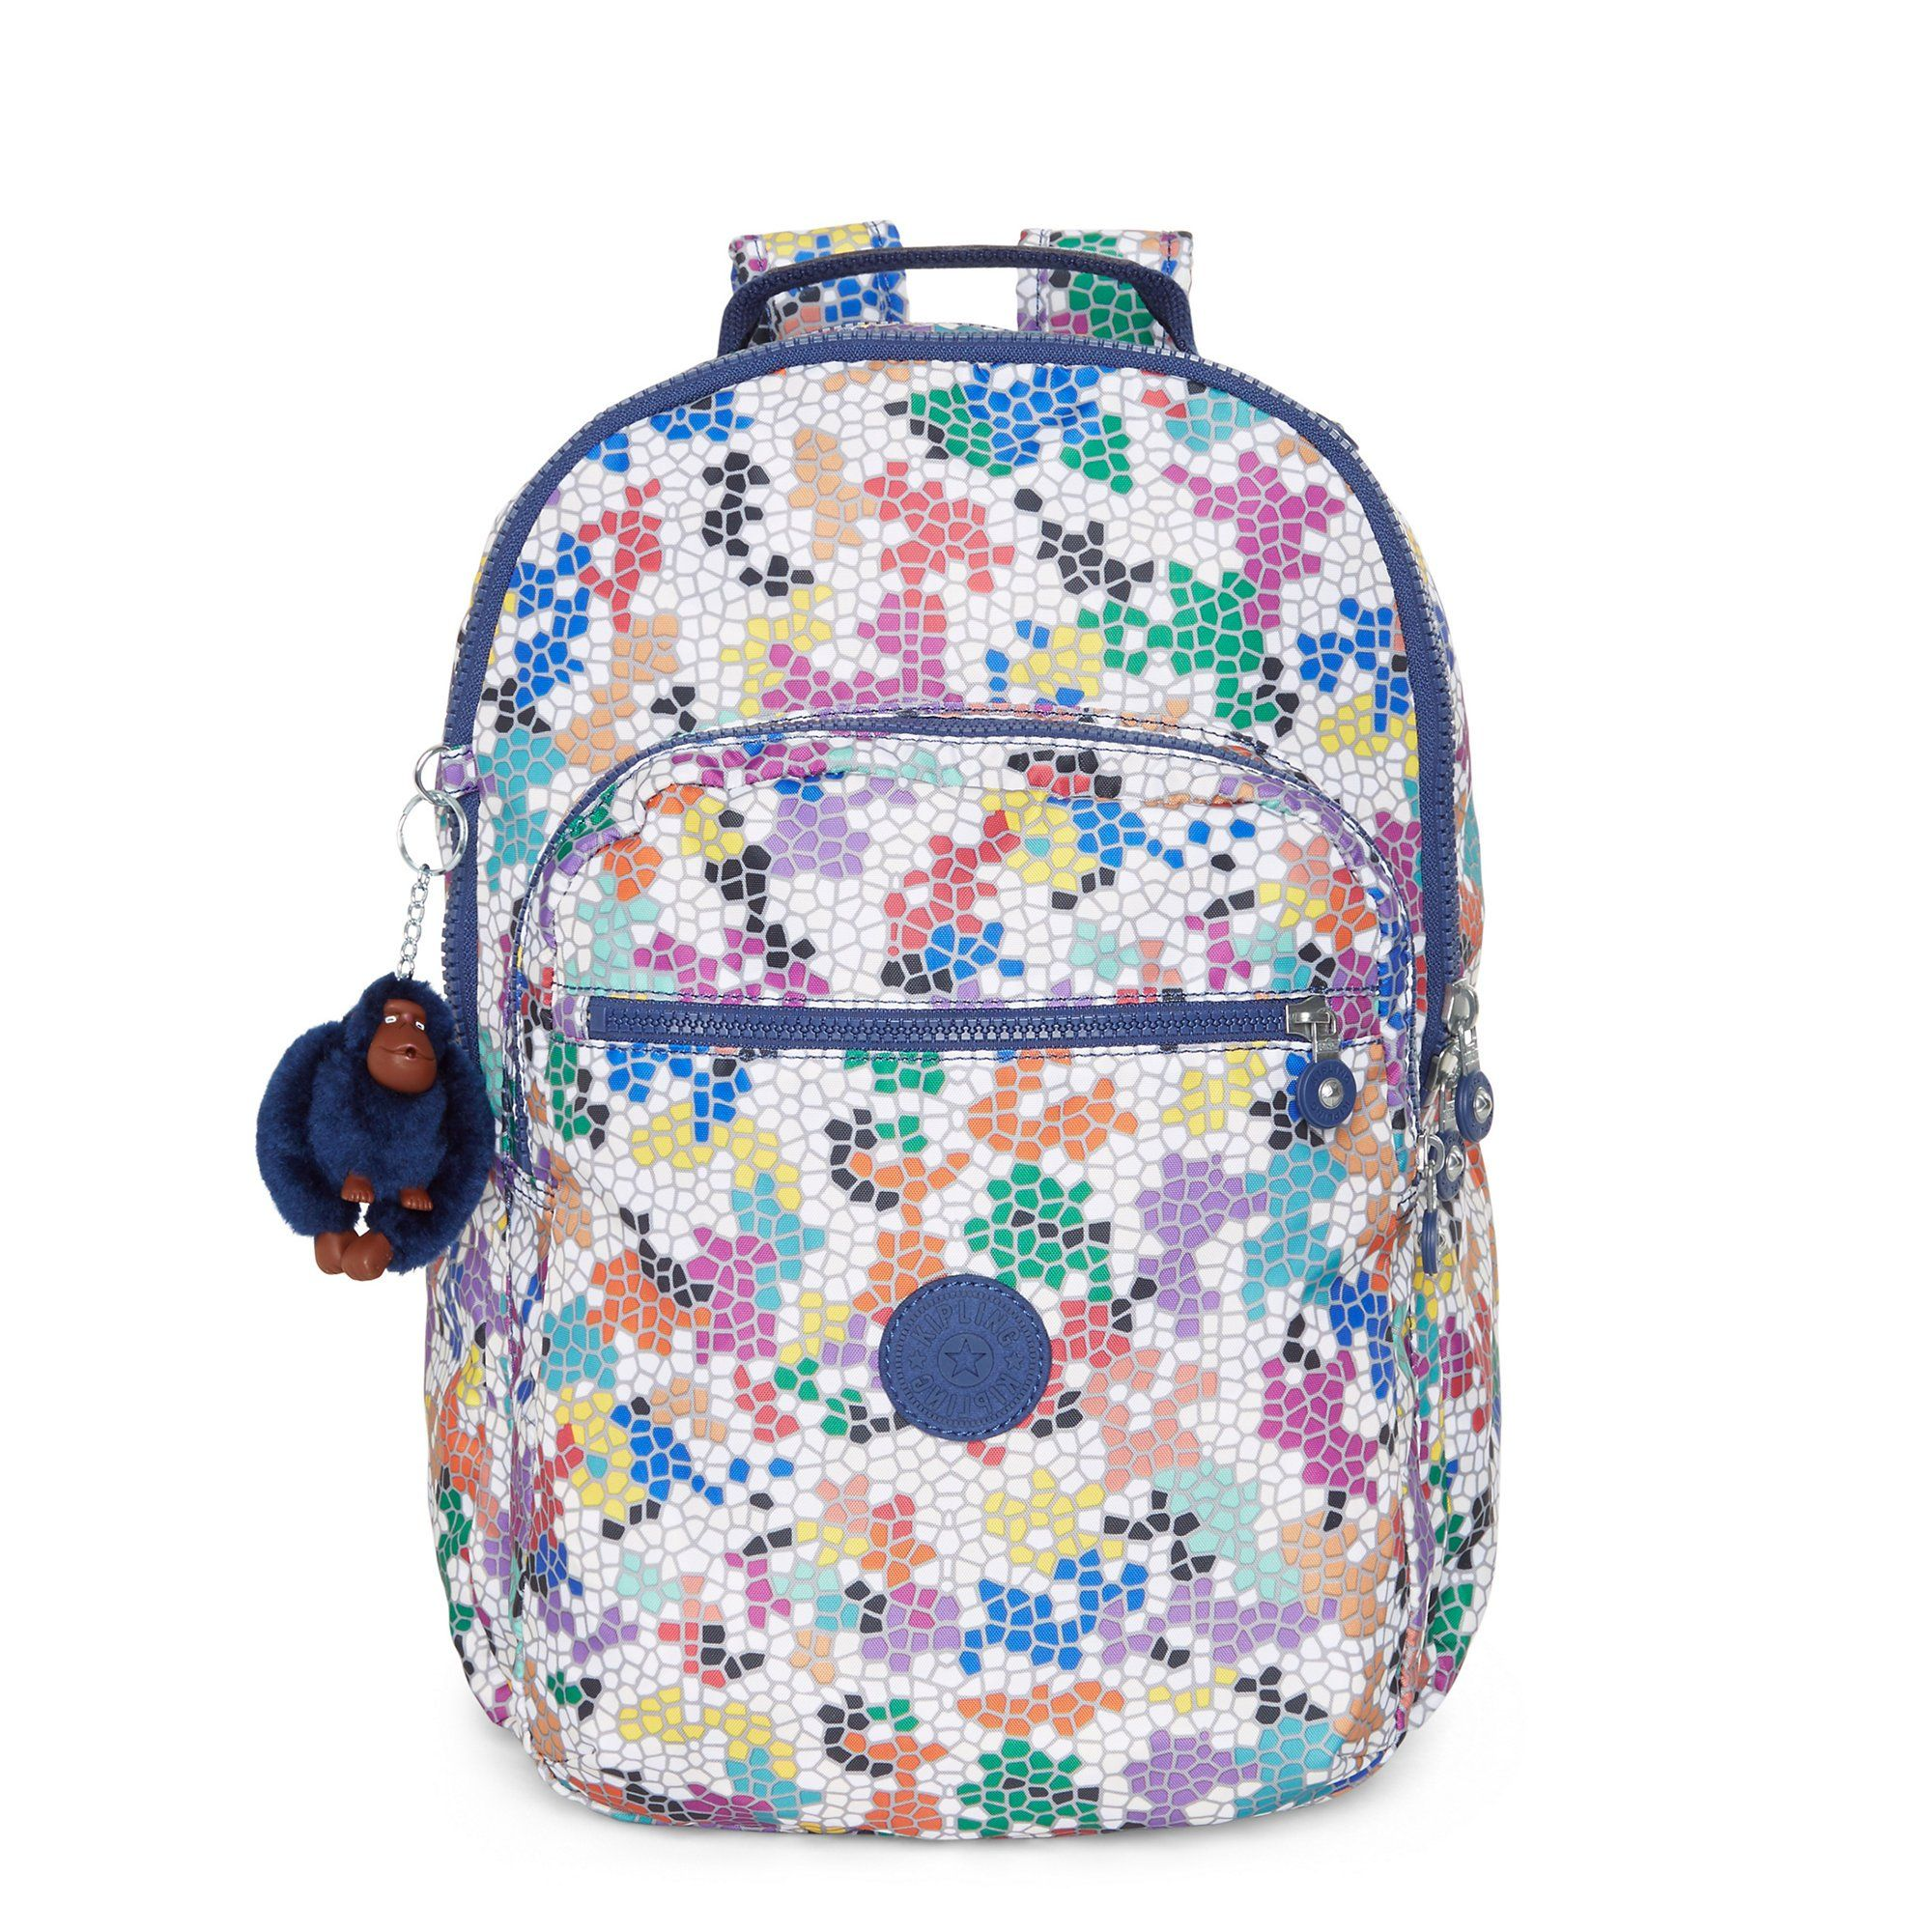 b458b6d473 Kipling Women s Seoul Large Printed Laptop Backpack One Size Spellbinder